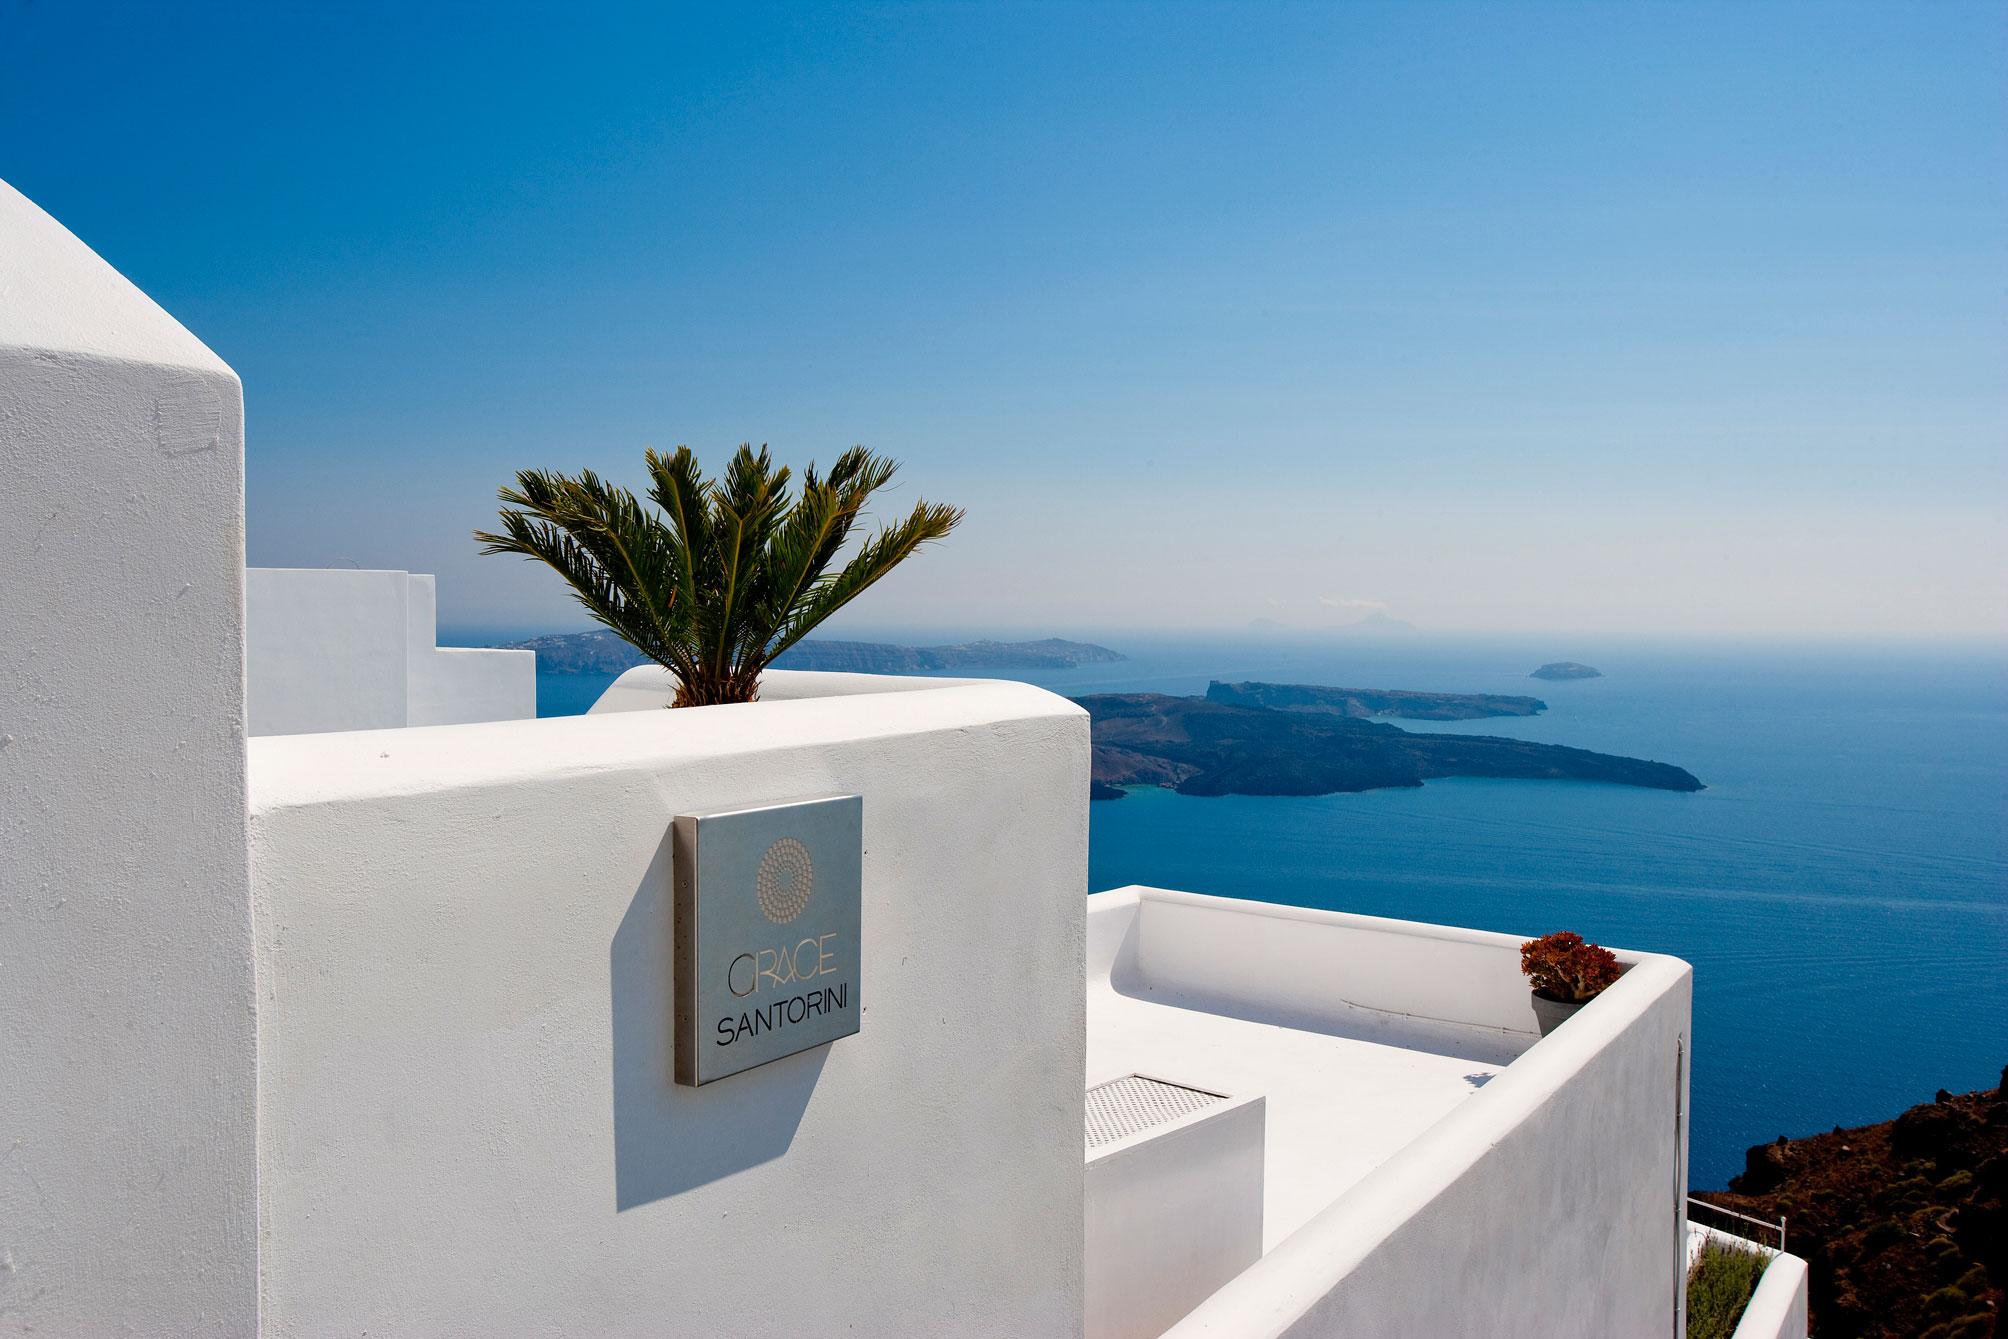 Grace-Santorini-Hotel-00-3